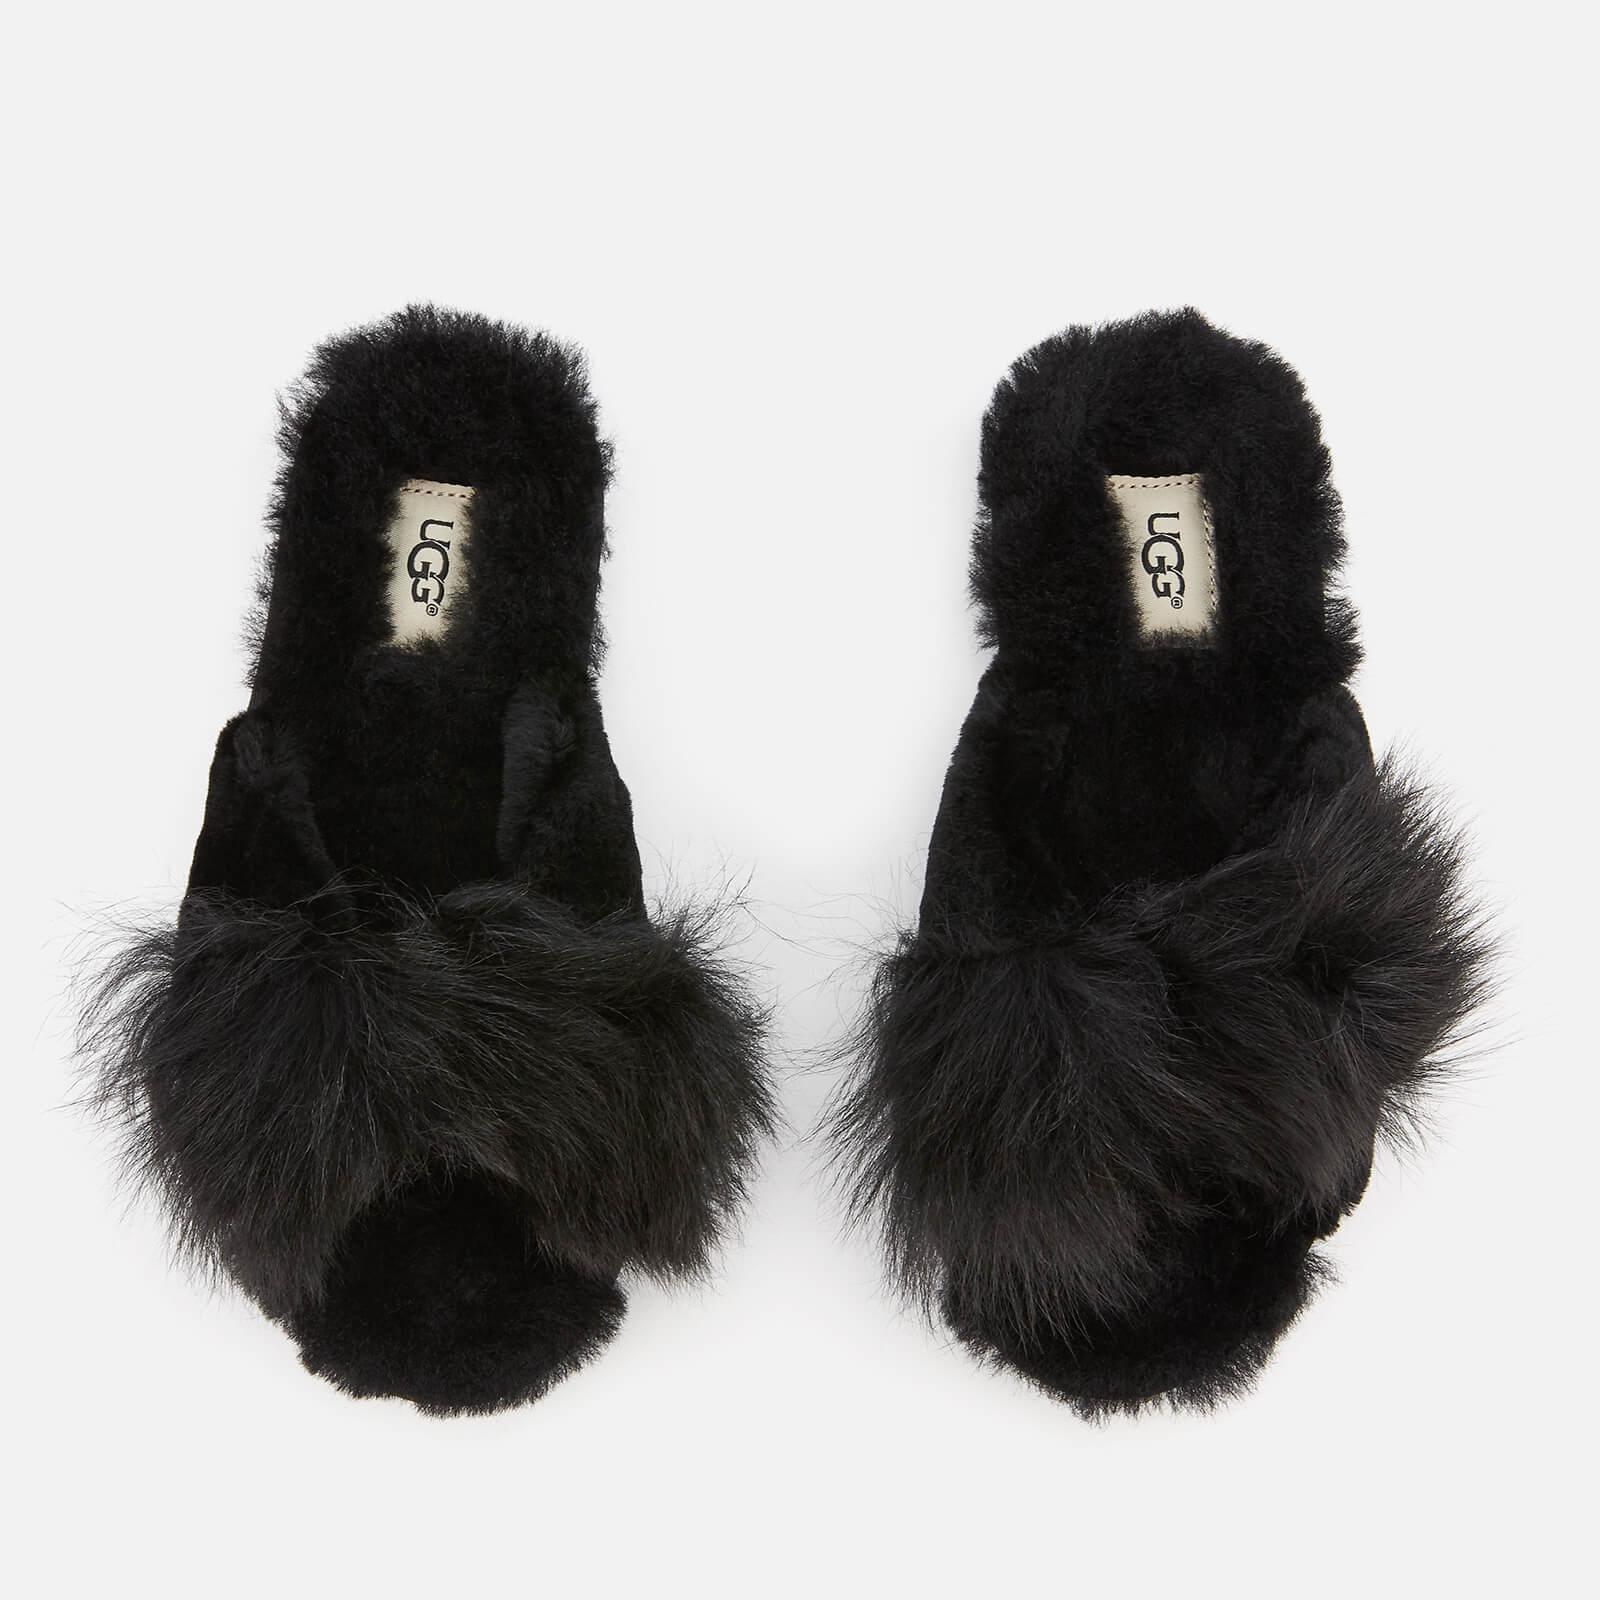 832d843a9f UGG Women s Mirabelle Sheepskin Slide Slippers - Black